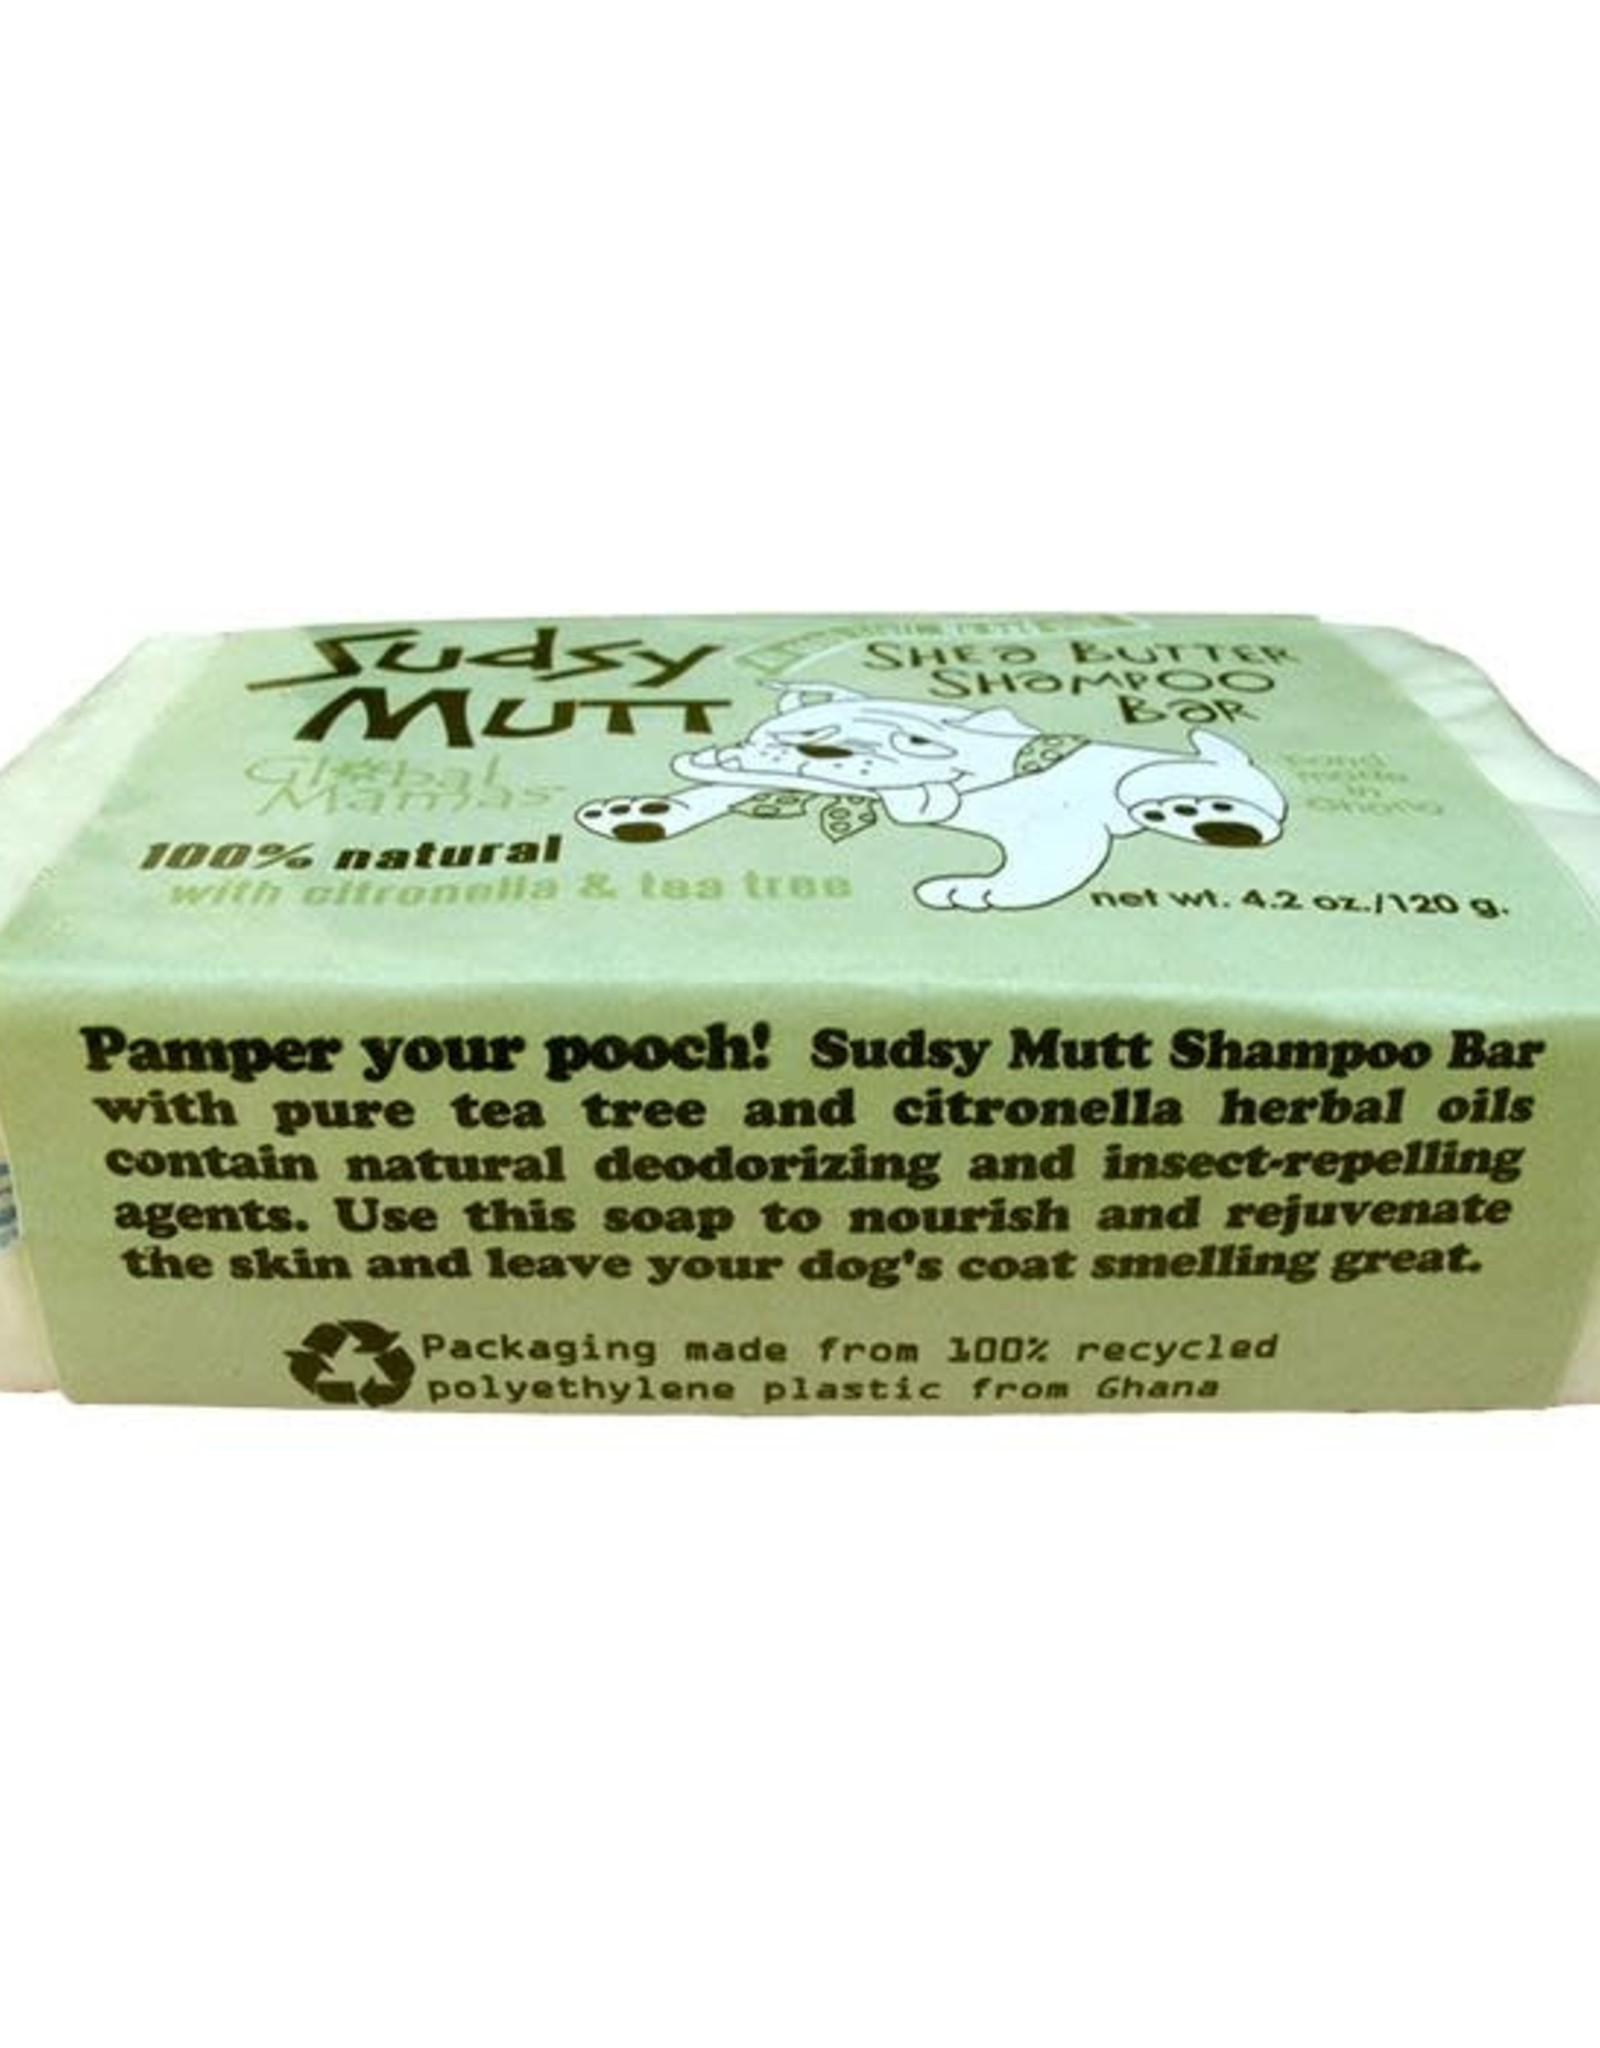 Sudsy Mutt Shea Butter Shampoo Bar